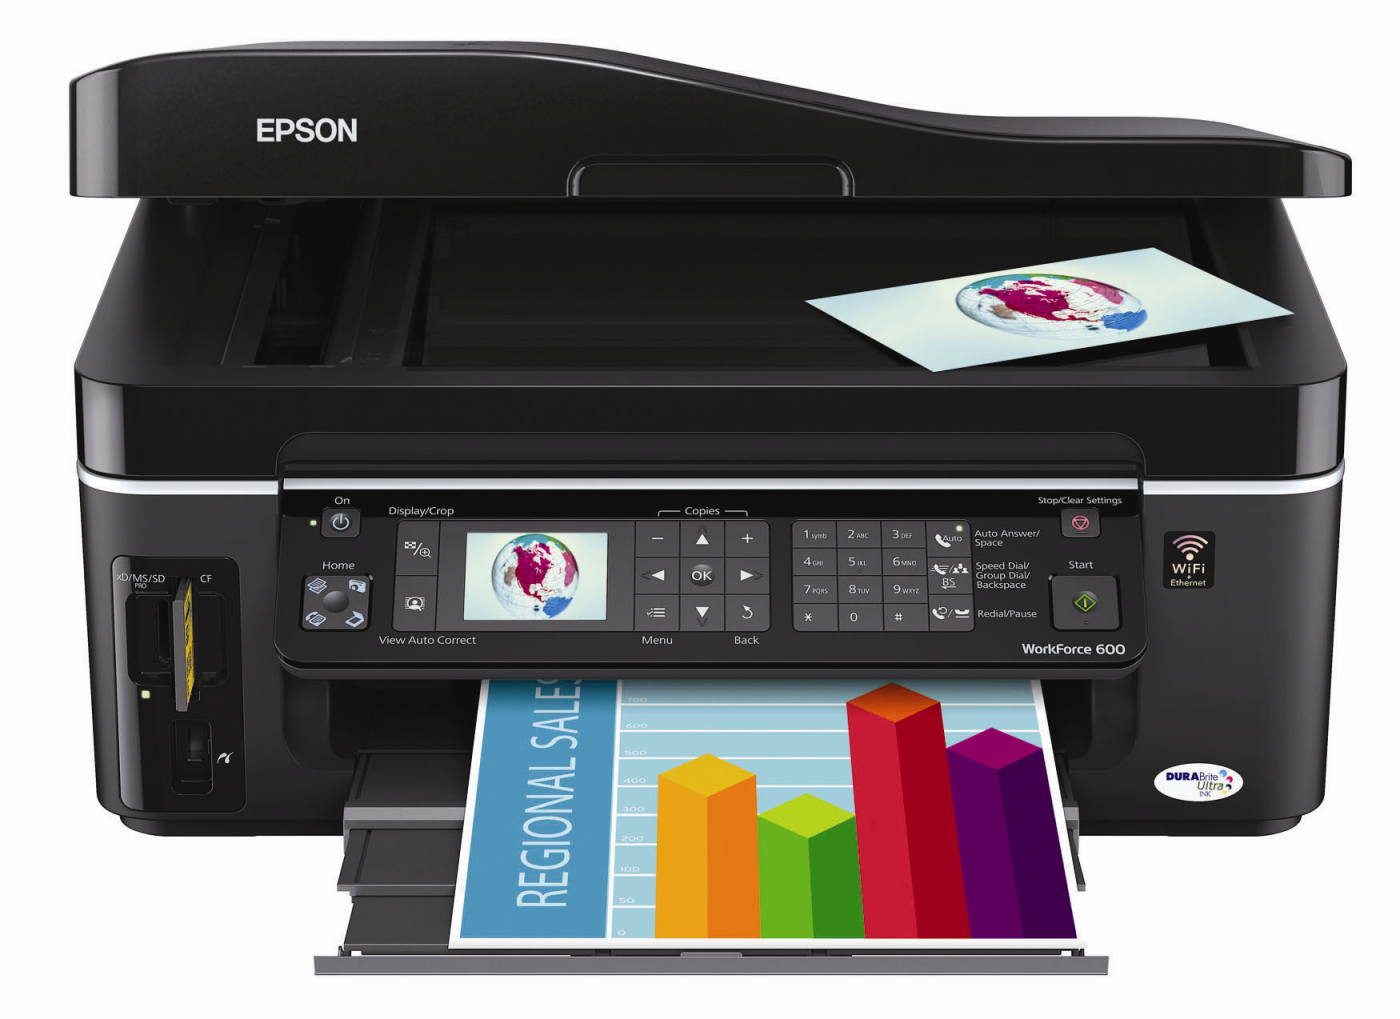 Epson Workforce 600 All-In-One Inkjet Printer: